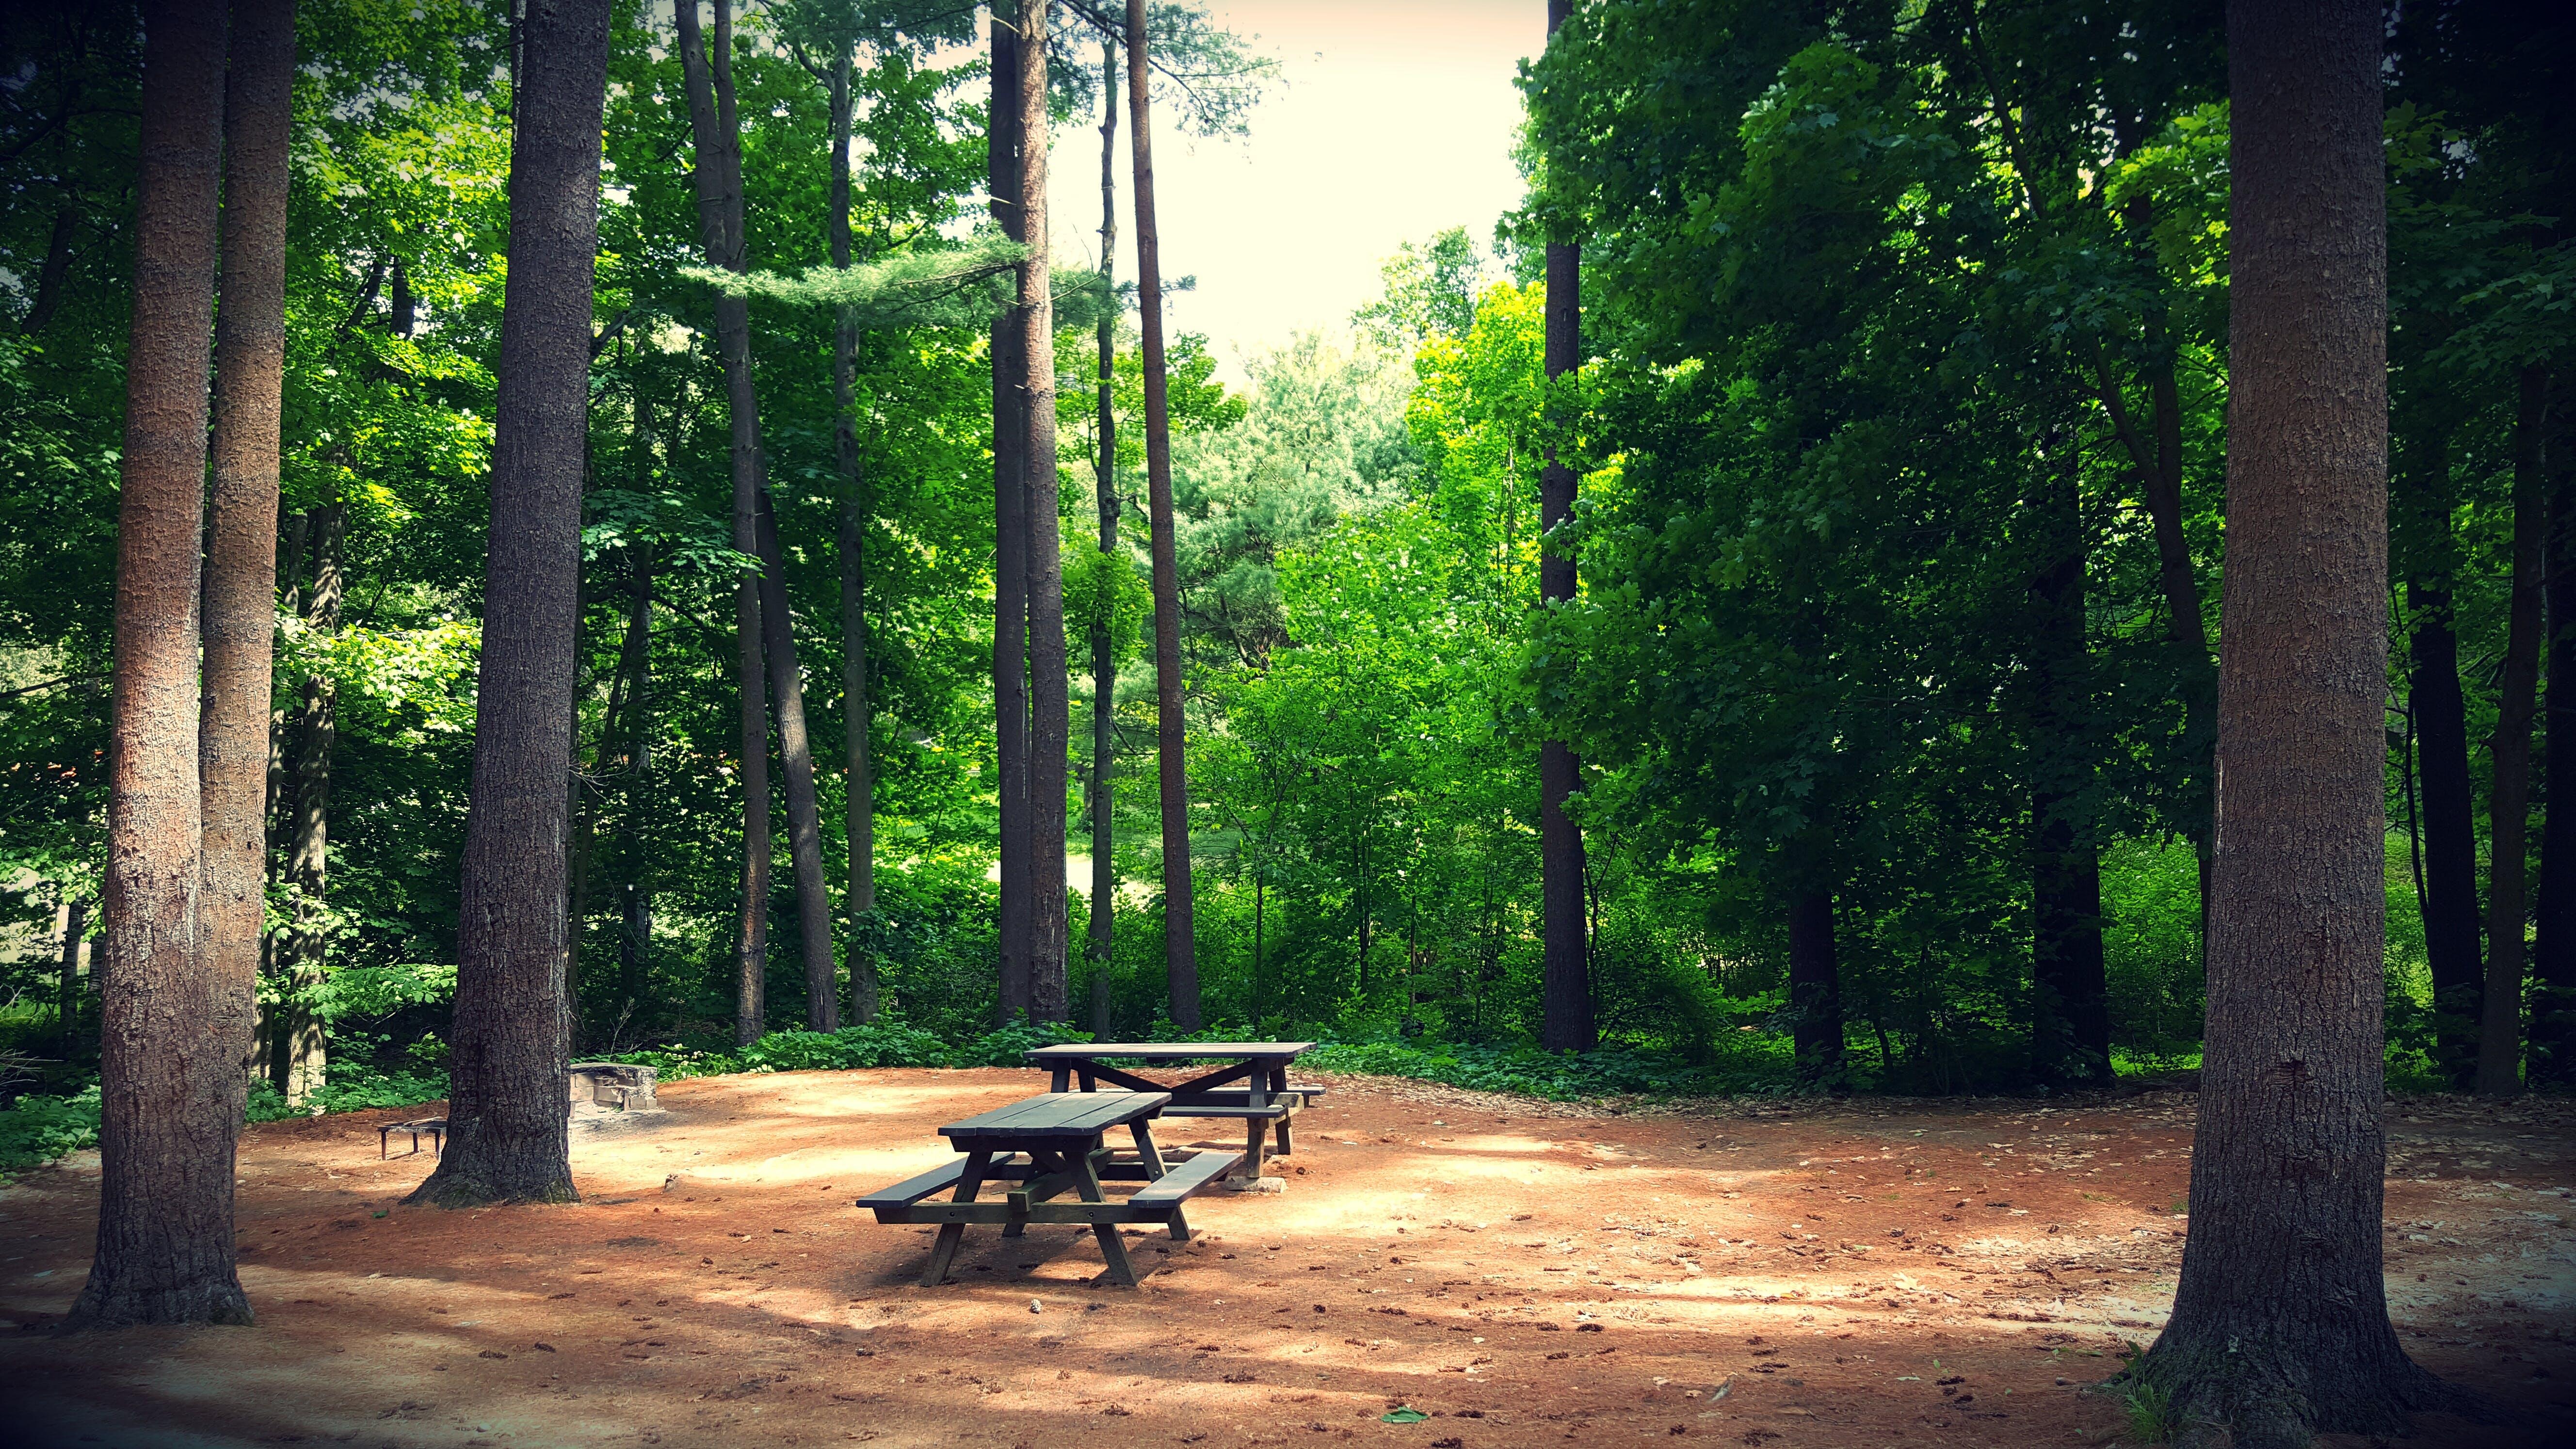 Kostenloses Stock Foto zu bank, bäume, campen, groß